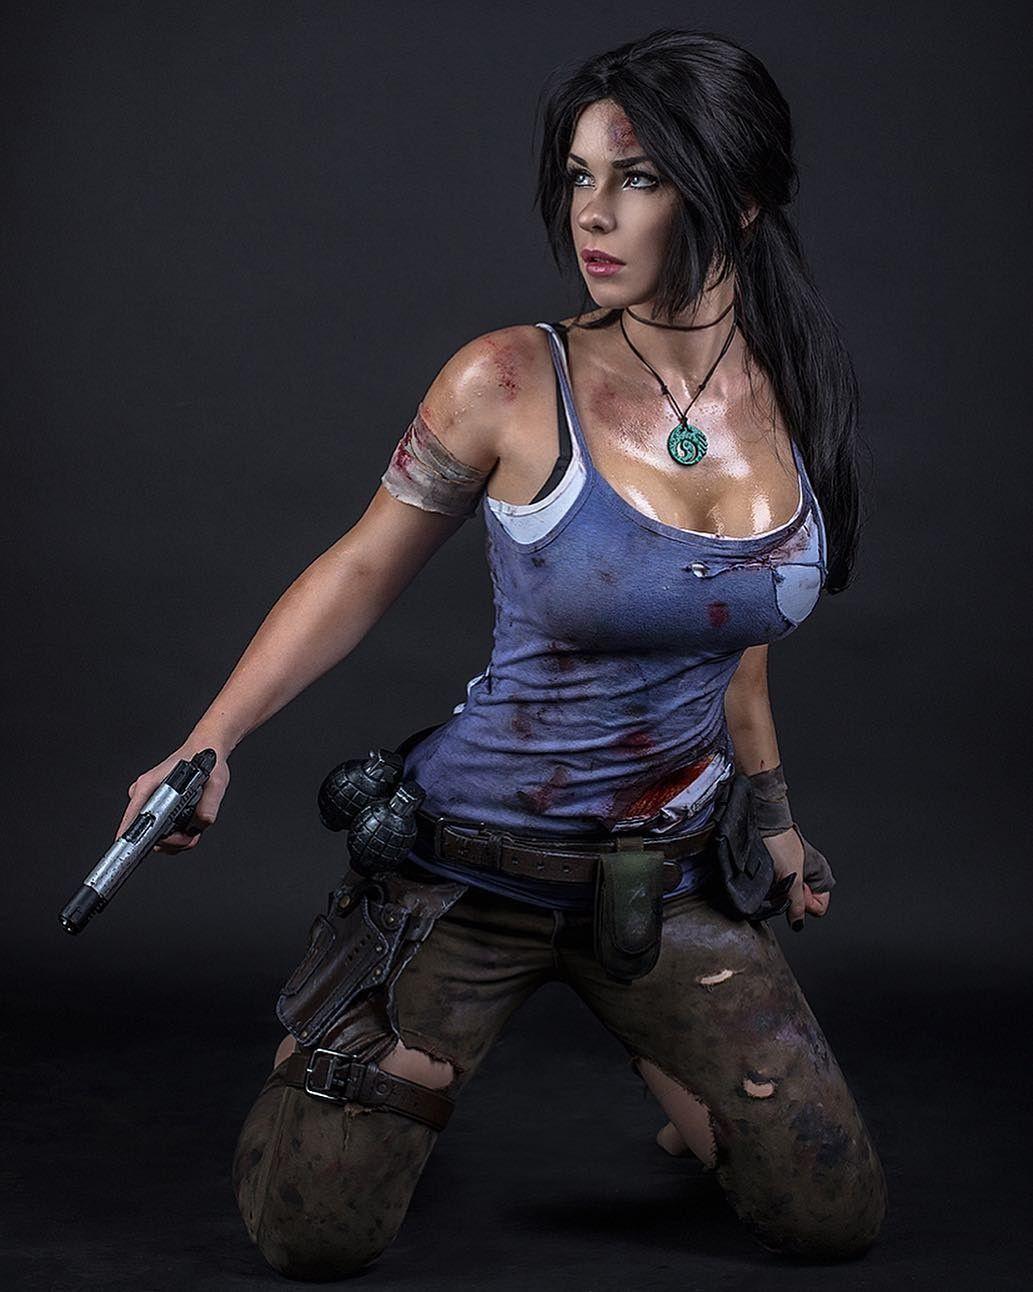 Lara fodona   Cosplay femenino, Chicas cosplay, Lara croft cosplay